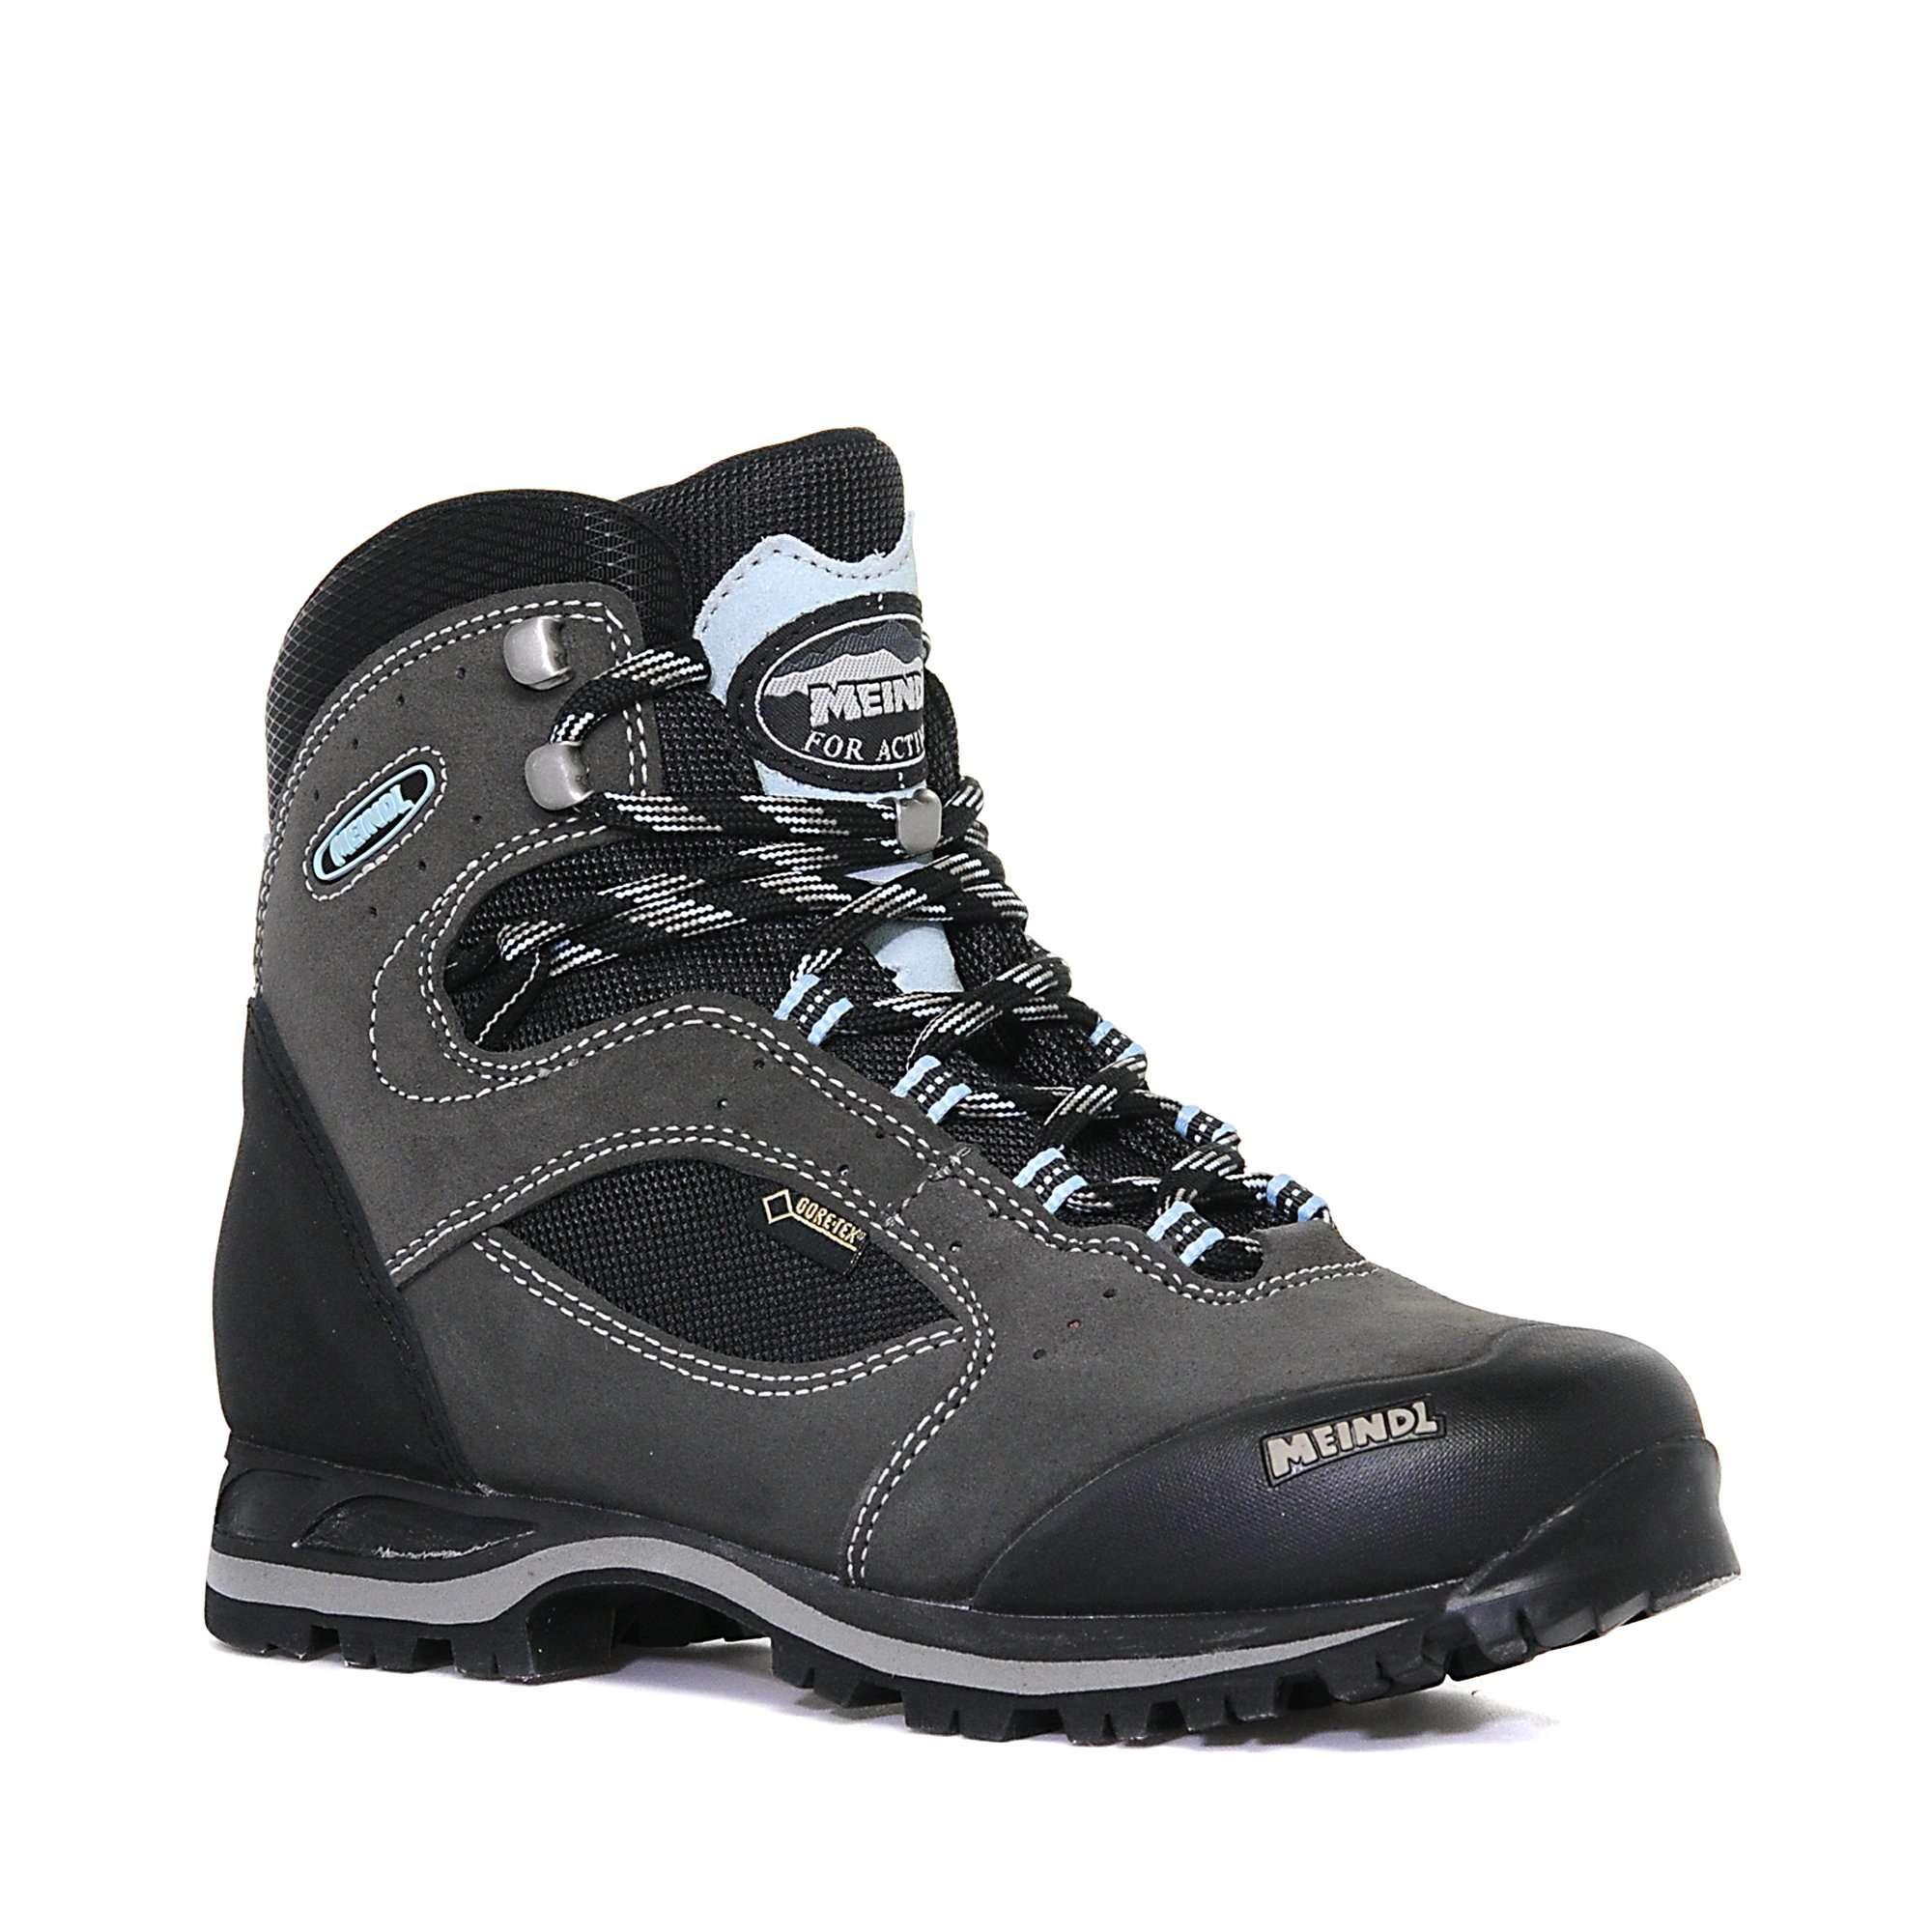 MEINDL Women's Softline Light GORE-TEX® Walking Boot